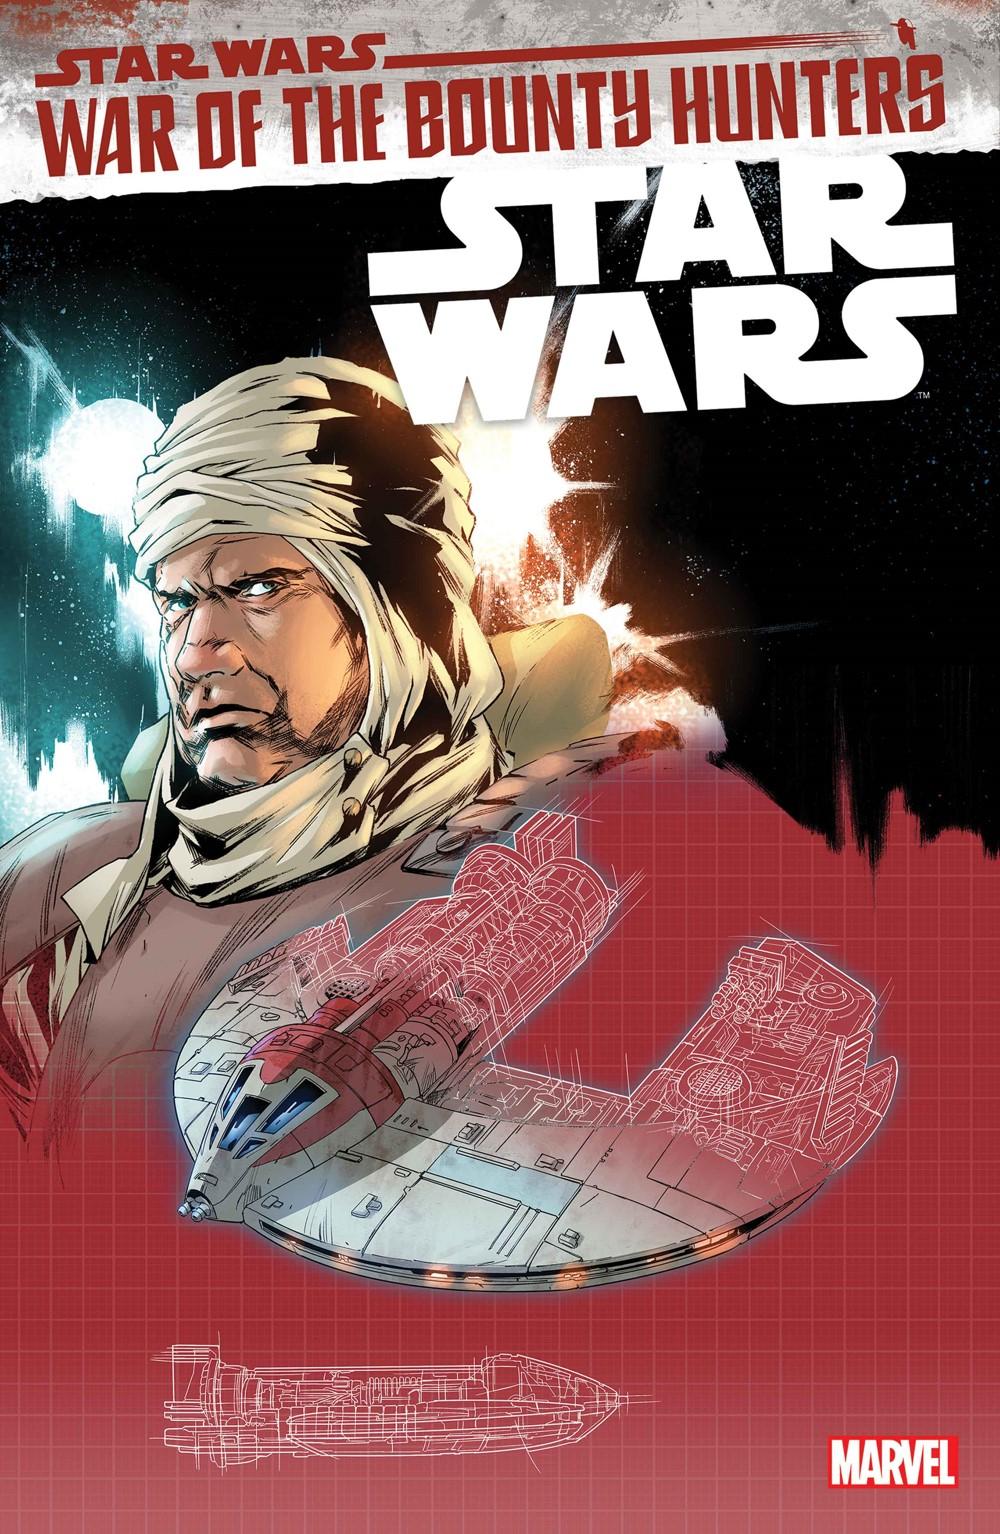 STWARS2020017_blueprint Marvel Comics September 2021 Solicitations